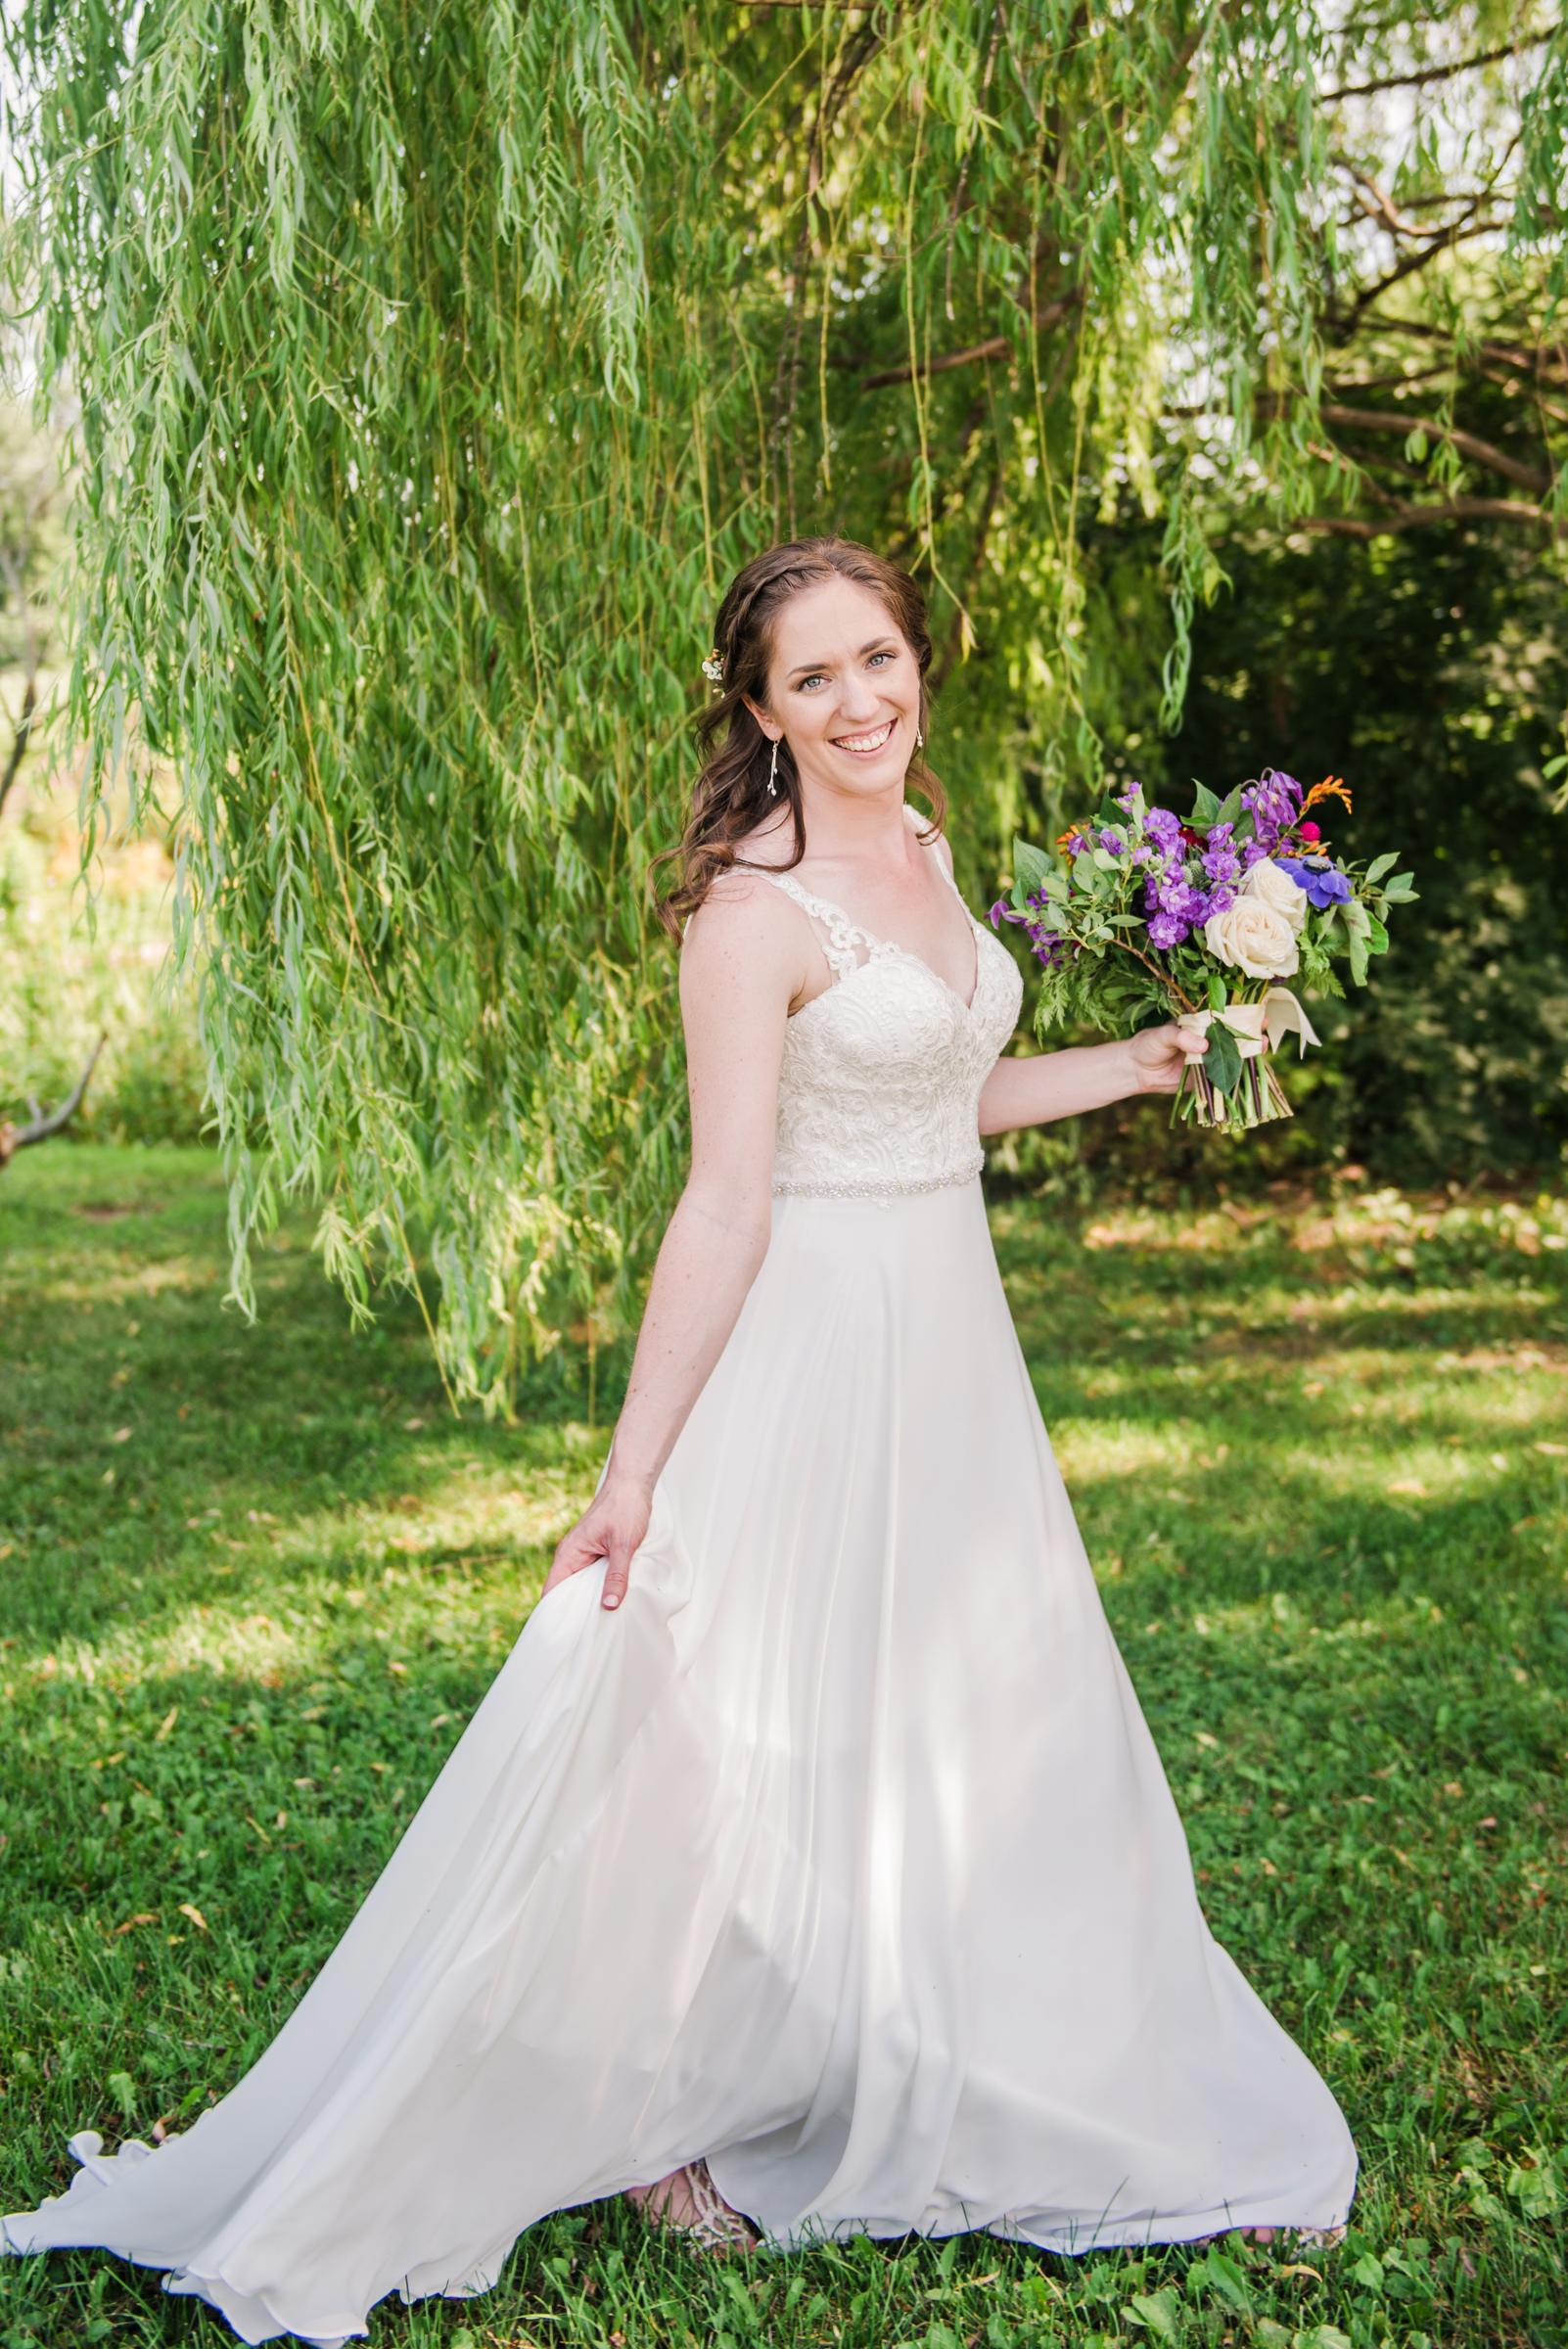 Jerris_Wadsworth_Wedding_Barn_Rochester_Wedding_JILL_STUDIO_Rochester_NY_Photographer_DSC_2518.jpg